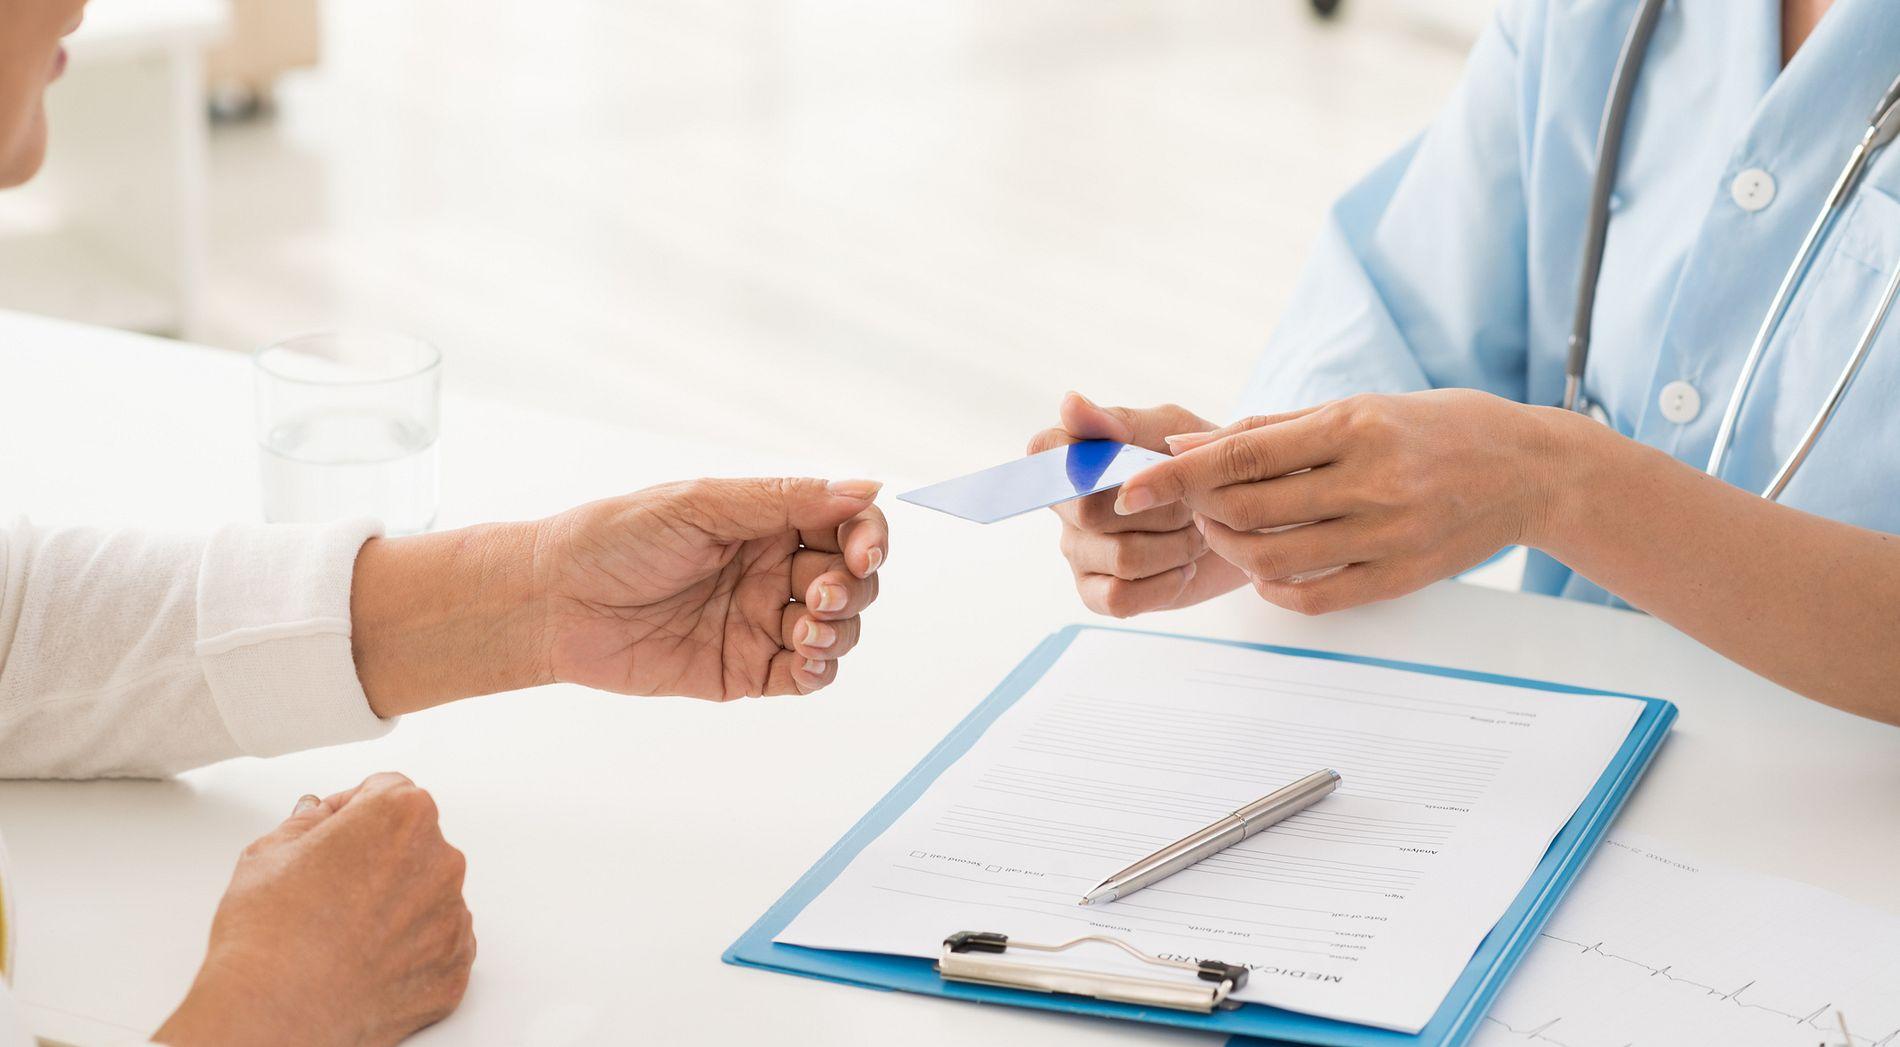 Nurse handing a card to a patient